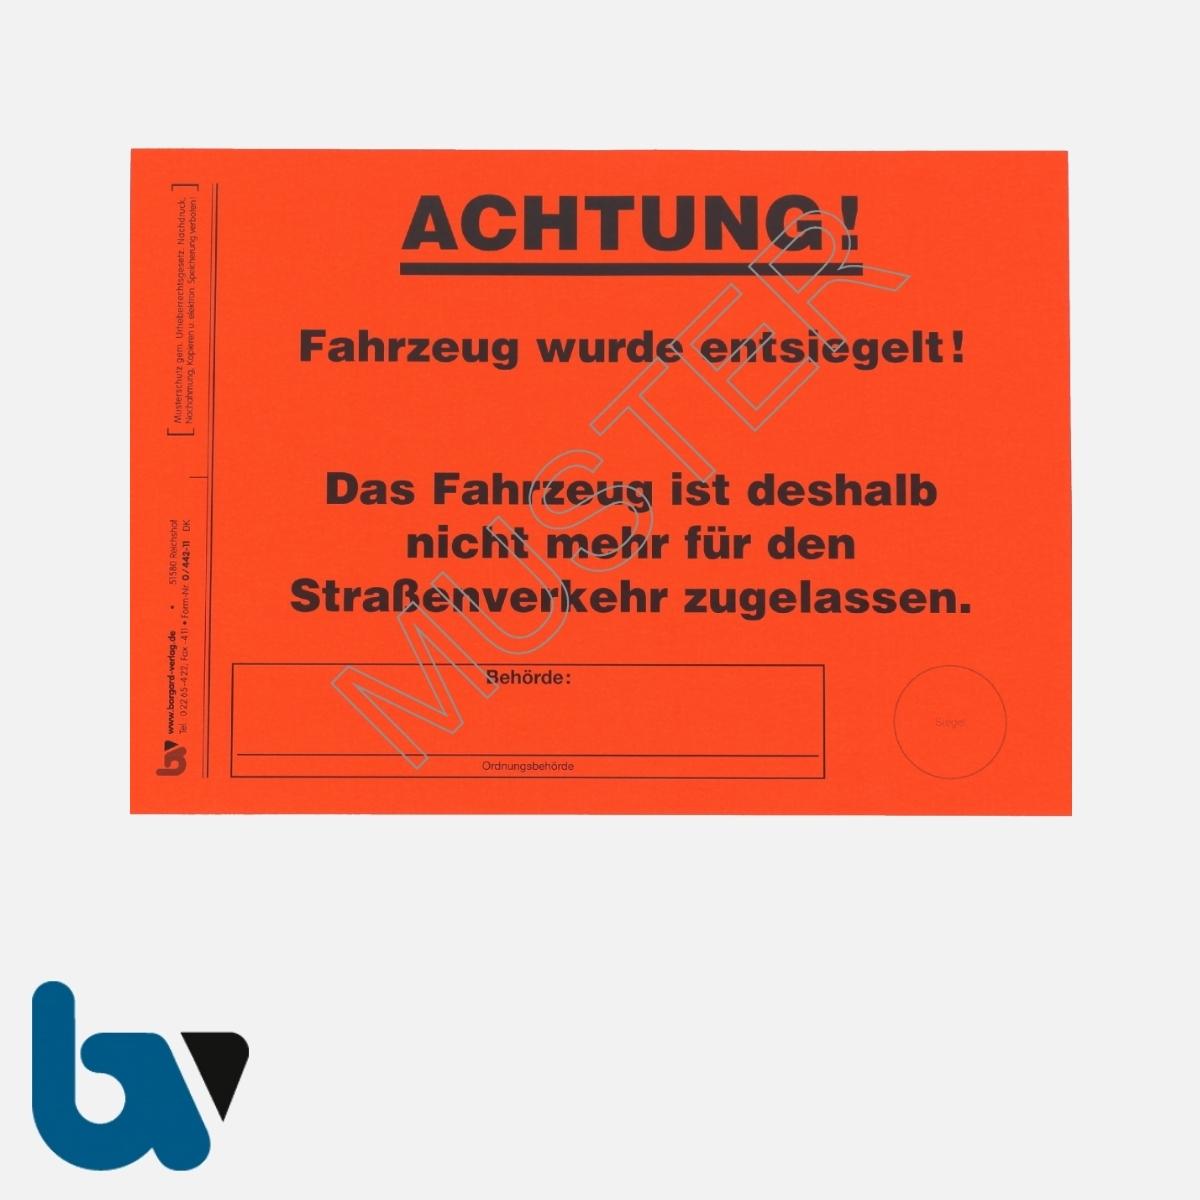 0/442-11 Aufkleber Aufforderung Fahrzeug selbstklebend Achtung entsiegelt Abfall DIN A5 | Borgard Verlag GmbH